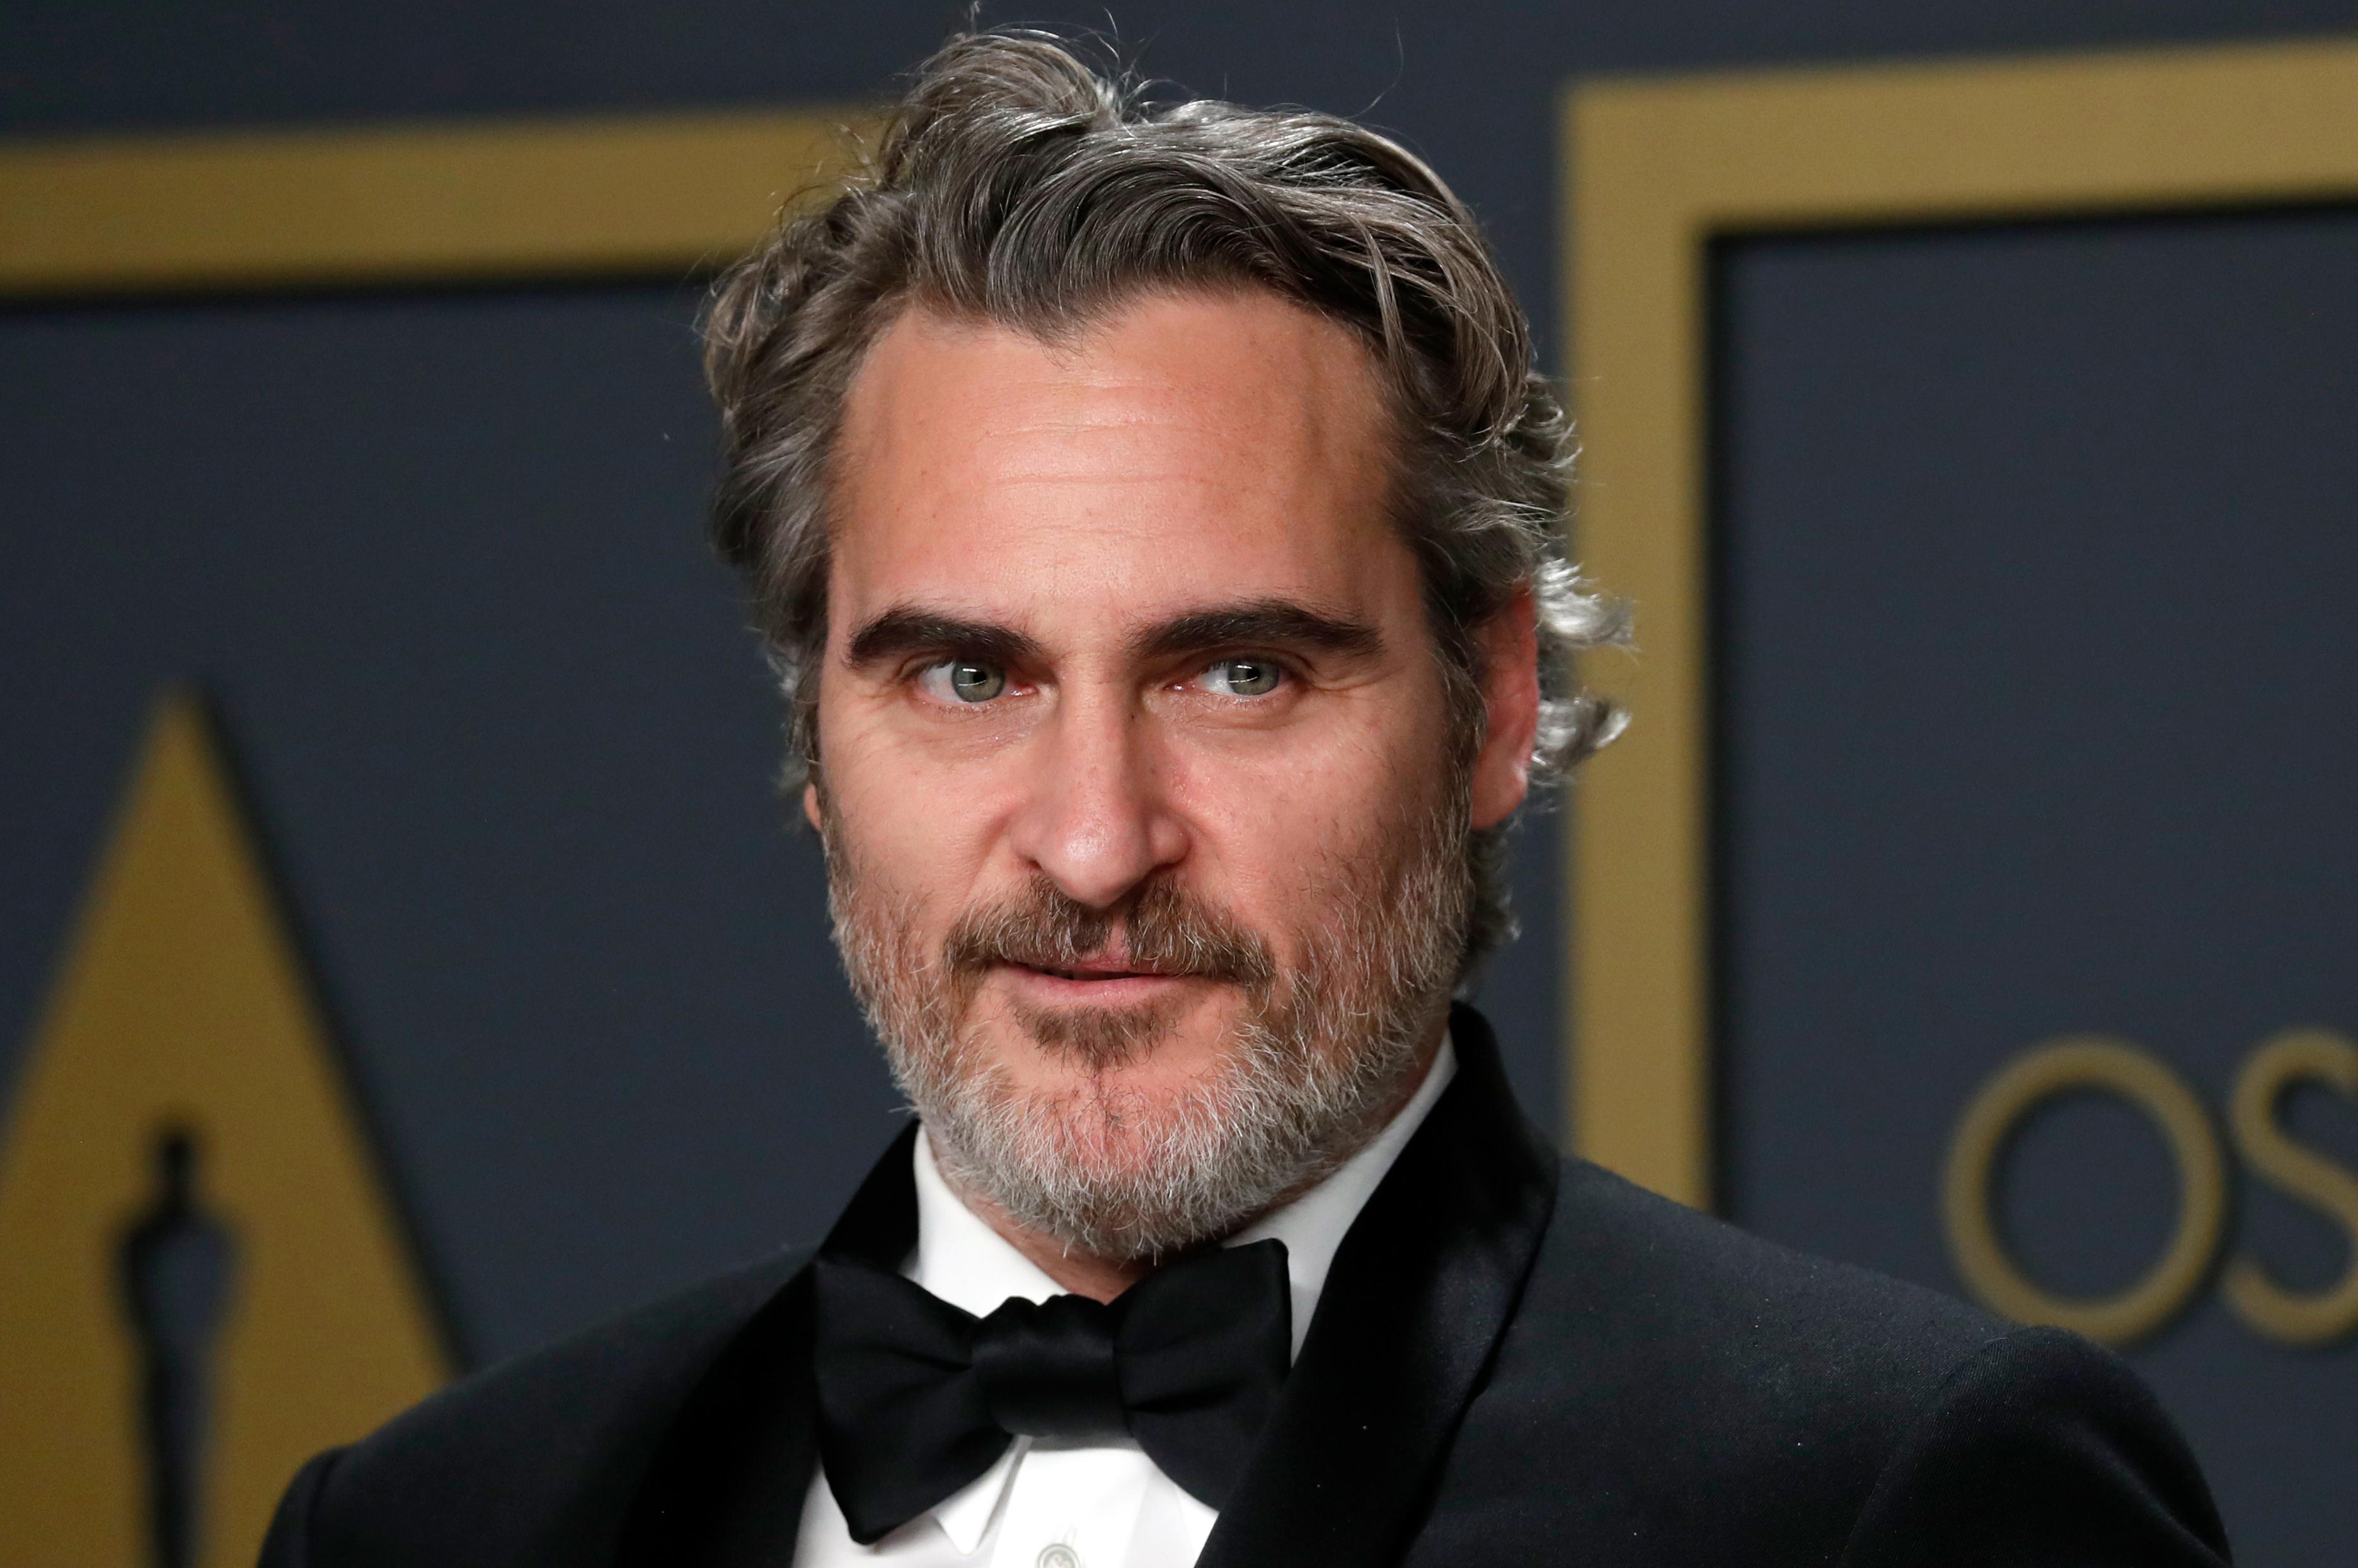 Apple will produce Ridley Scott's upcoming Napoleon biopic